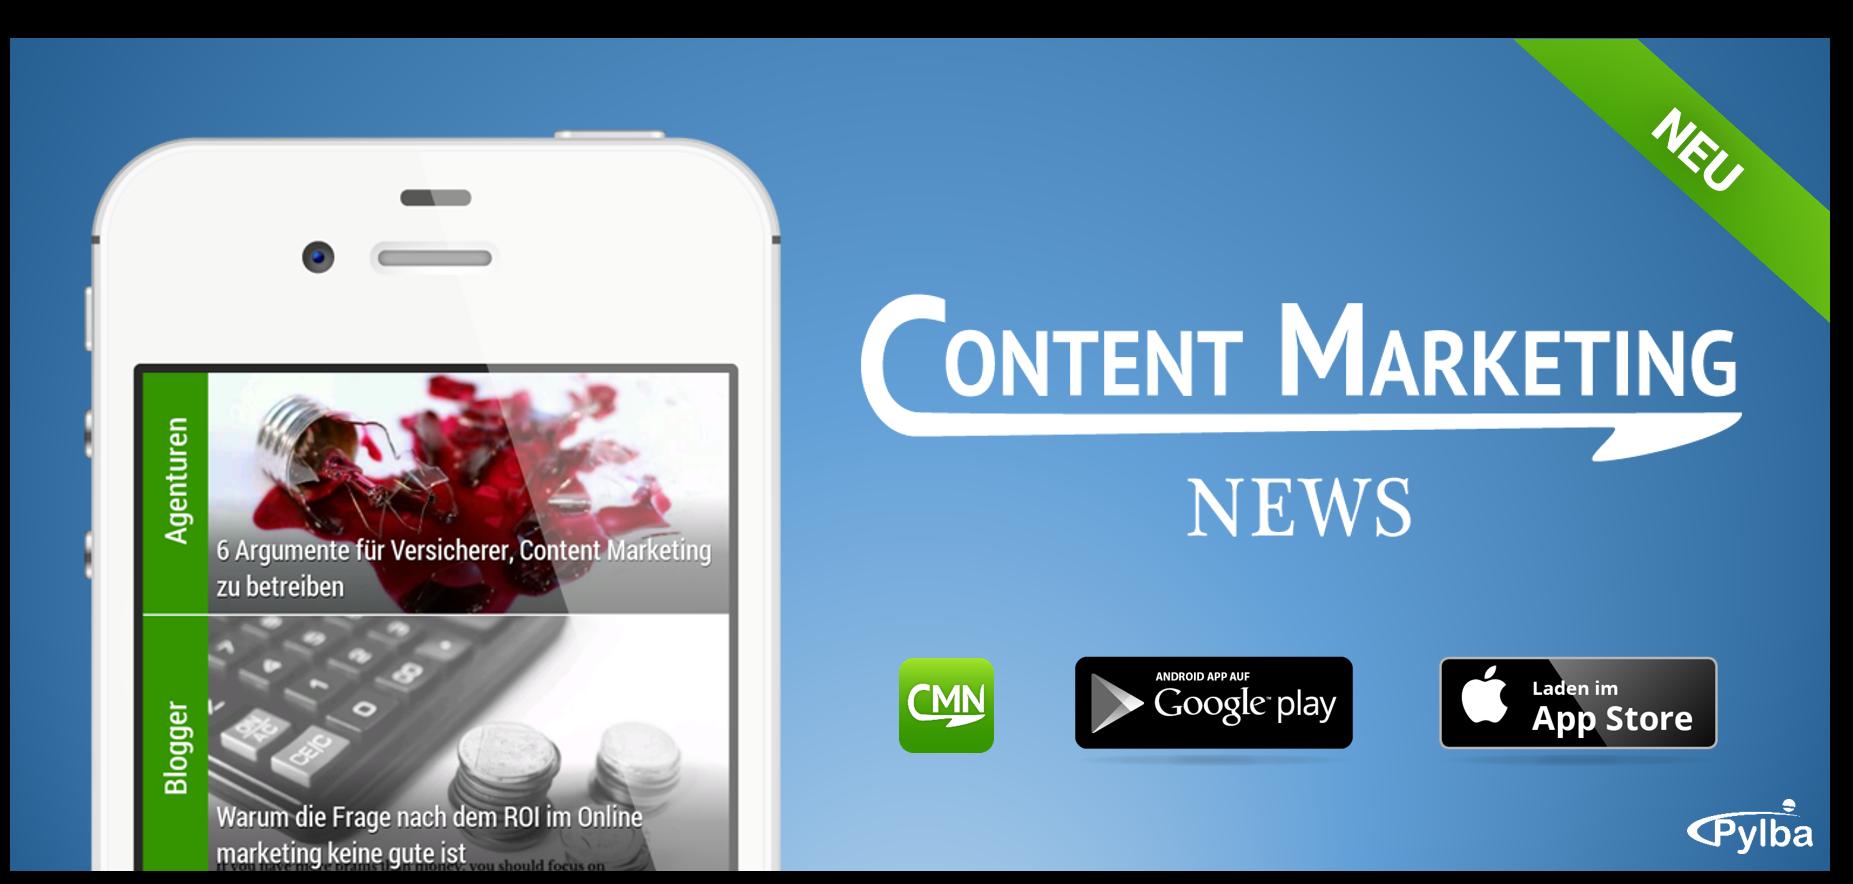 Neu im App Store: Content Marketing News